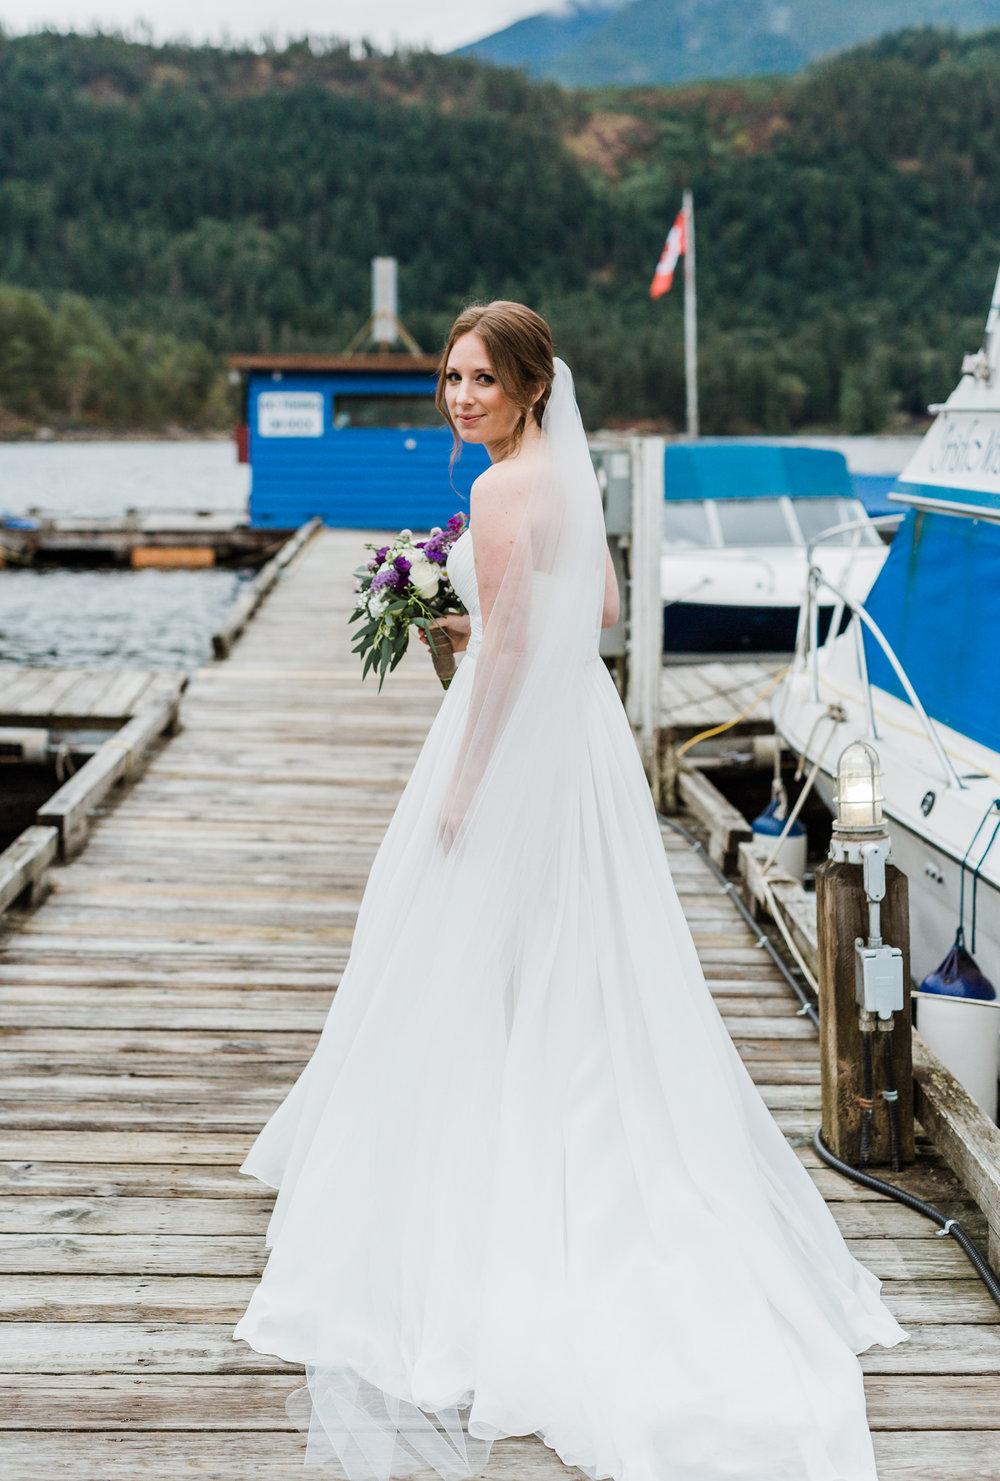 West Coast Wilderness Lodge Wedding Photos - Vancouver Wedding Photographer & Videographer - Sunshine Coast Wedding Photos - Sunshine Coast Wedding Photographer - Jennifer Picard Photography - IMG_5722.jpg